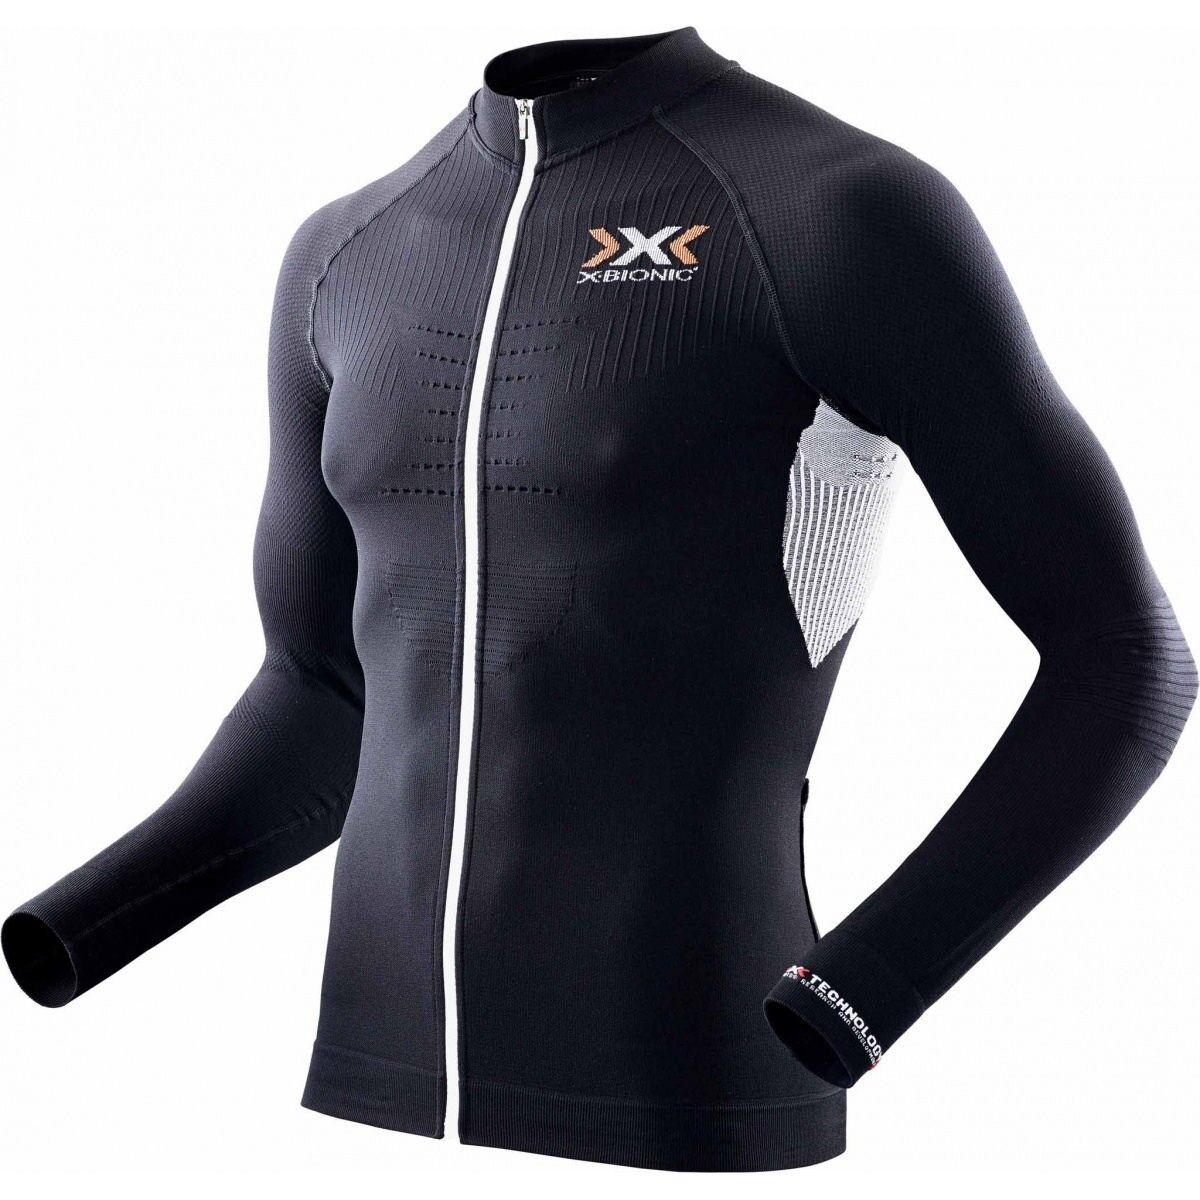 X-BIONIC the CICLISMO si the X-BIONIC trucco OW SHIRT CYCLING Manica Lunga Nero f83fad